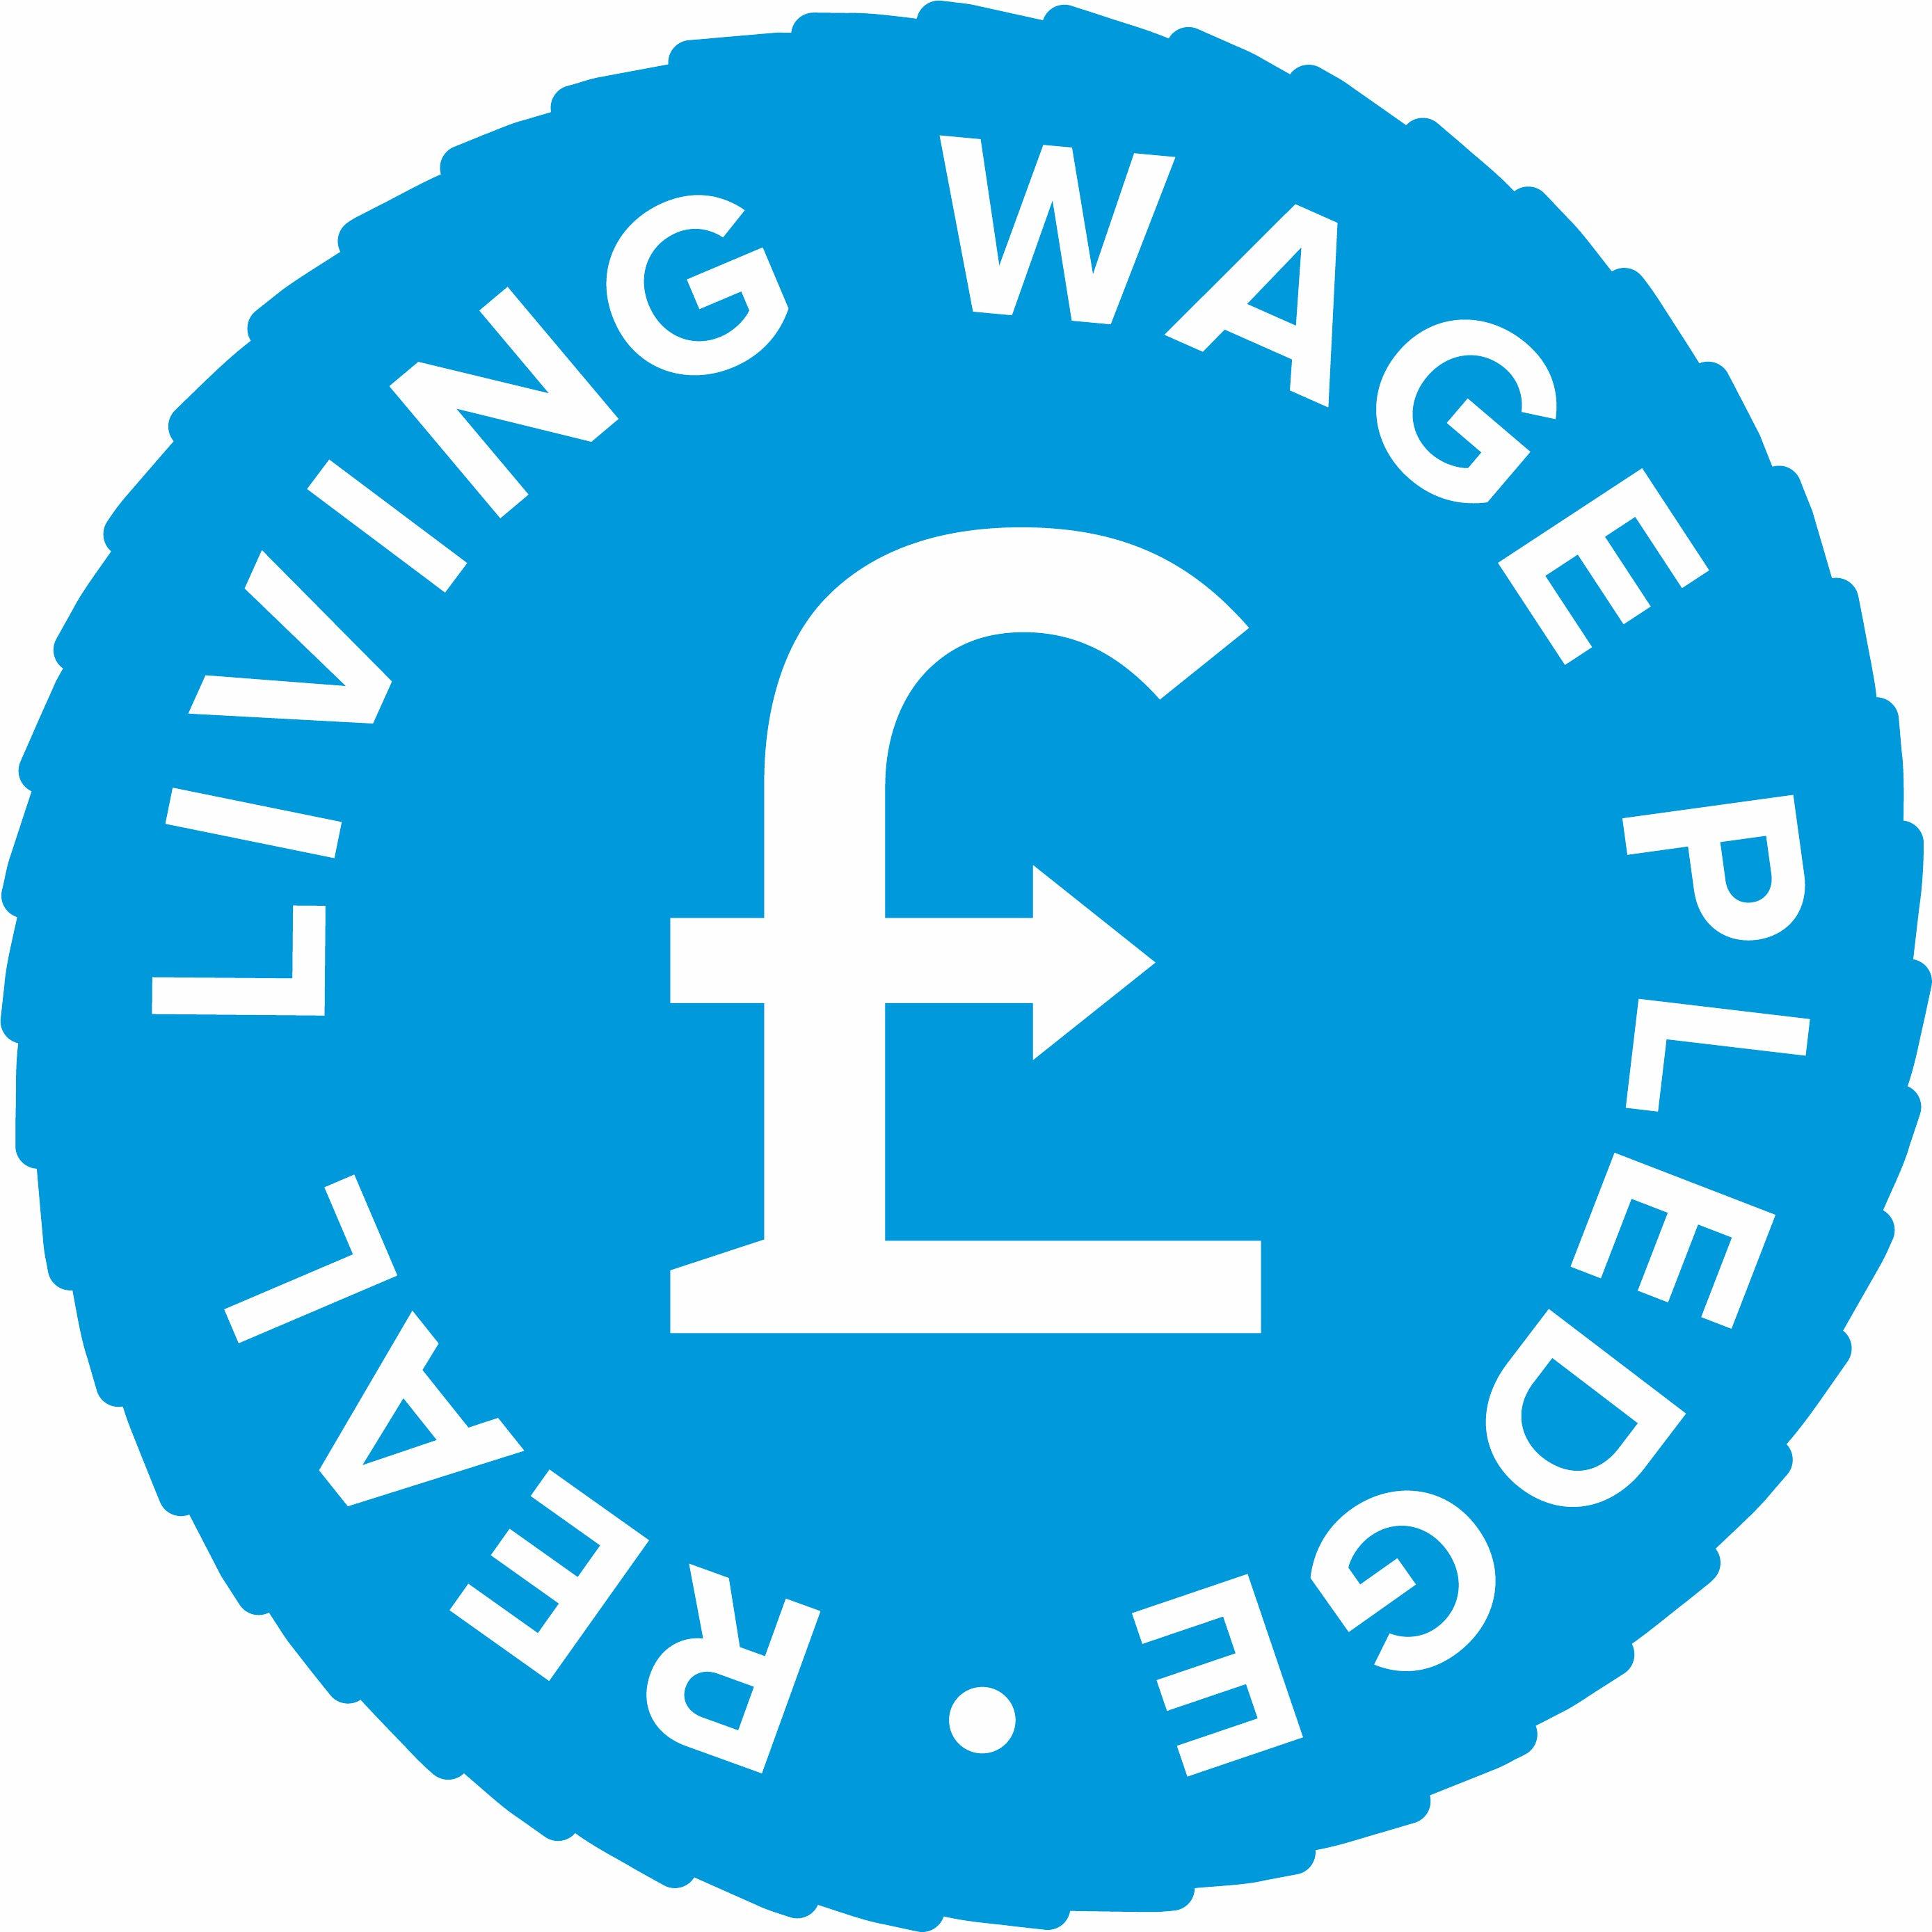 Real Living Wage Pledge